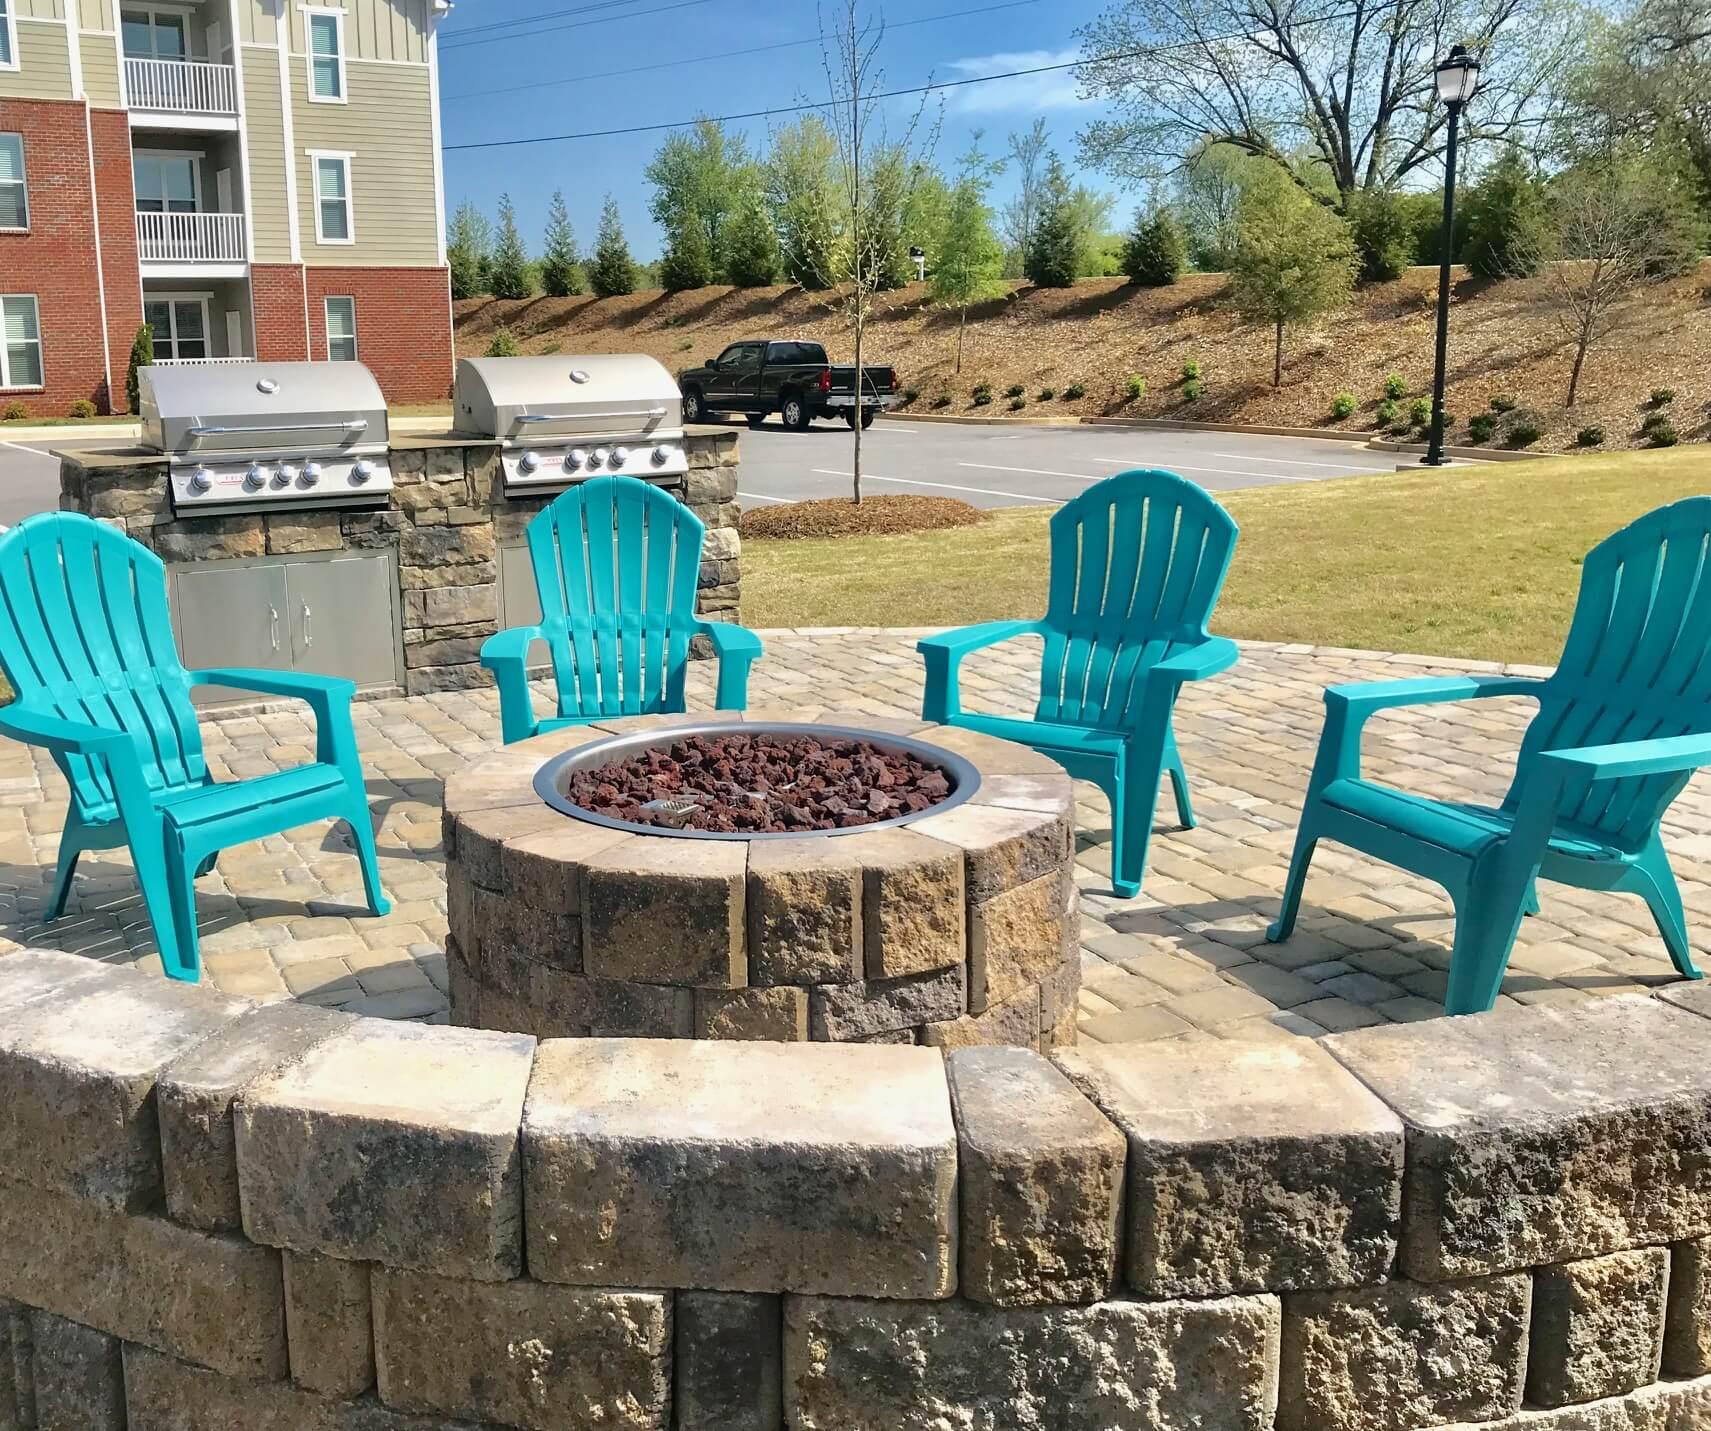 Copper Terrace Apartments: Apartment Homes In Simpsonville, SC